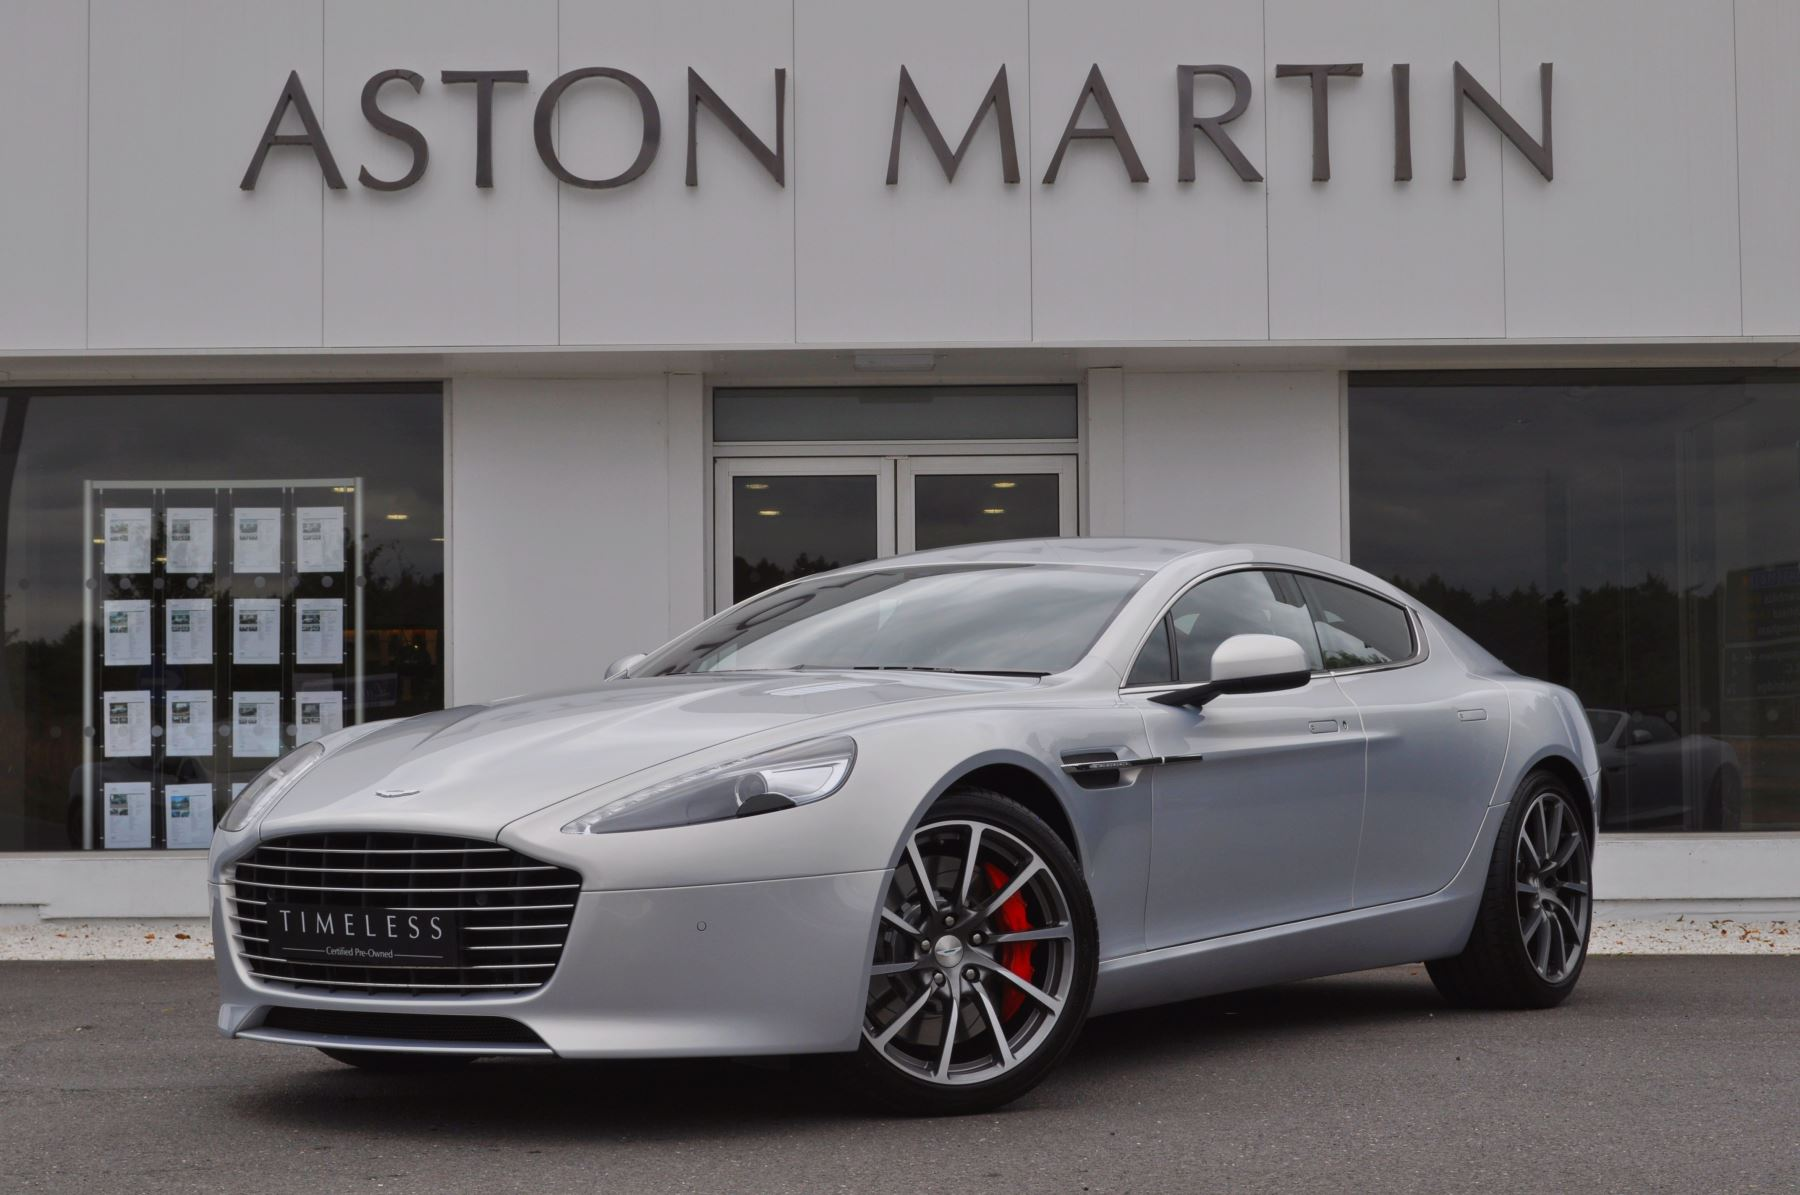 Used Aston Martin Rapide S Aston Martin Birmingham Cars For Sale - Used aston martin rapide